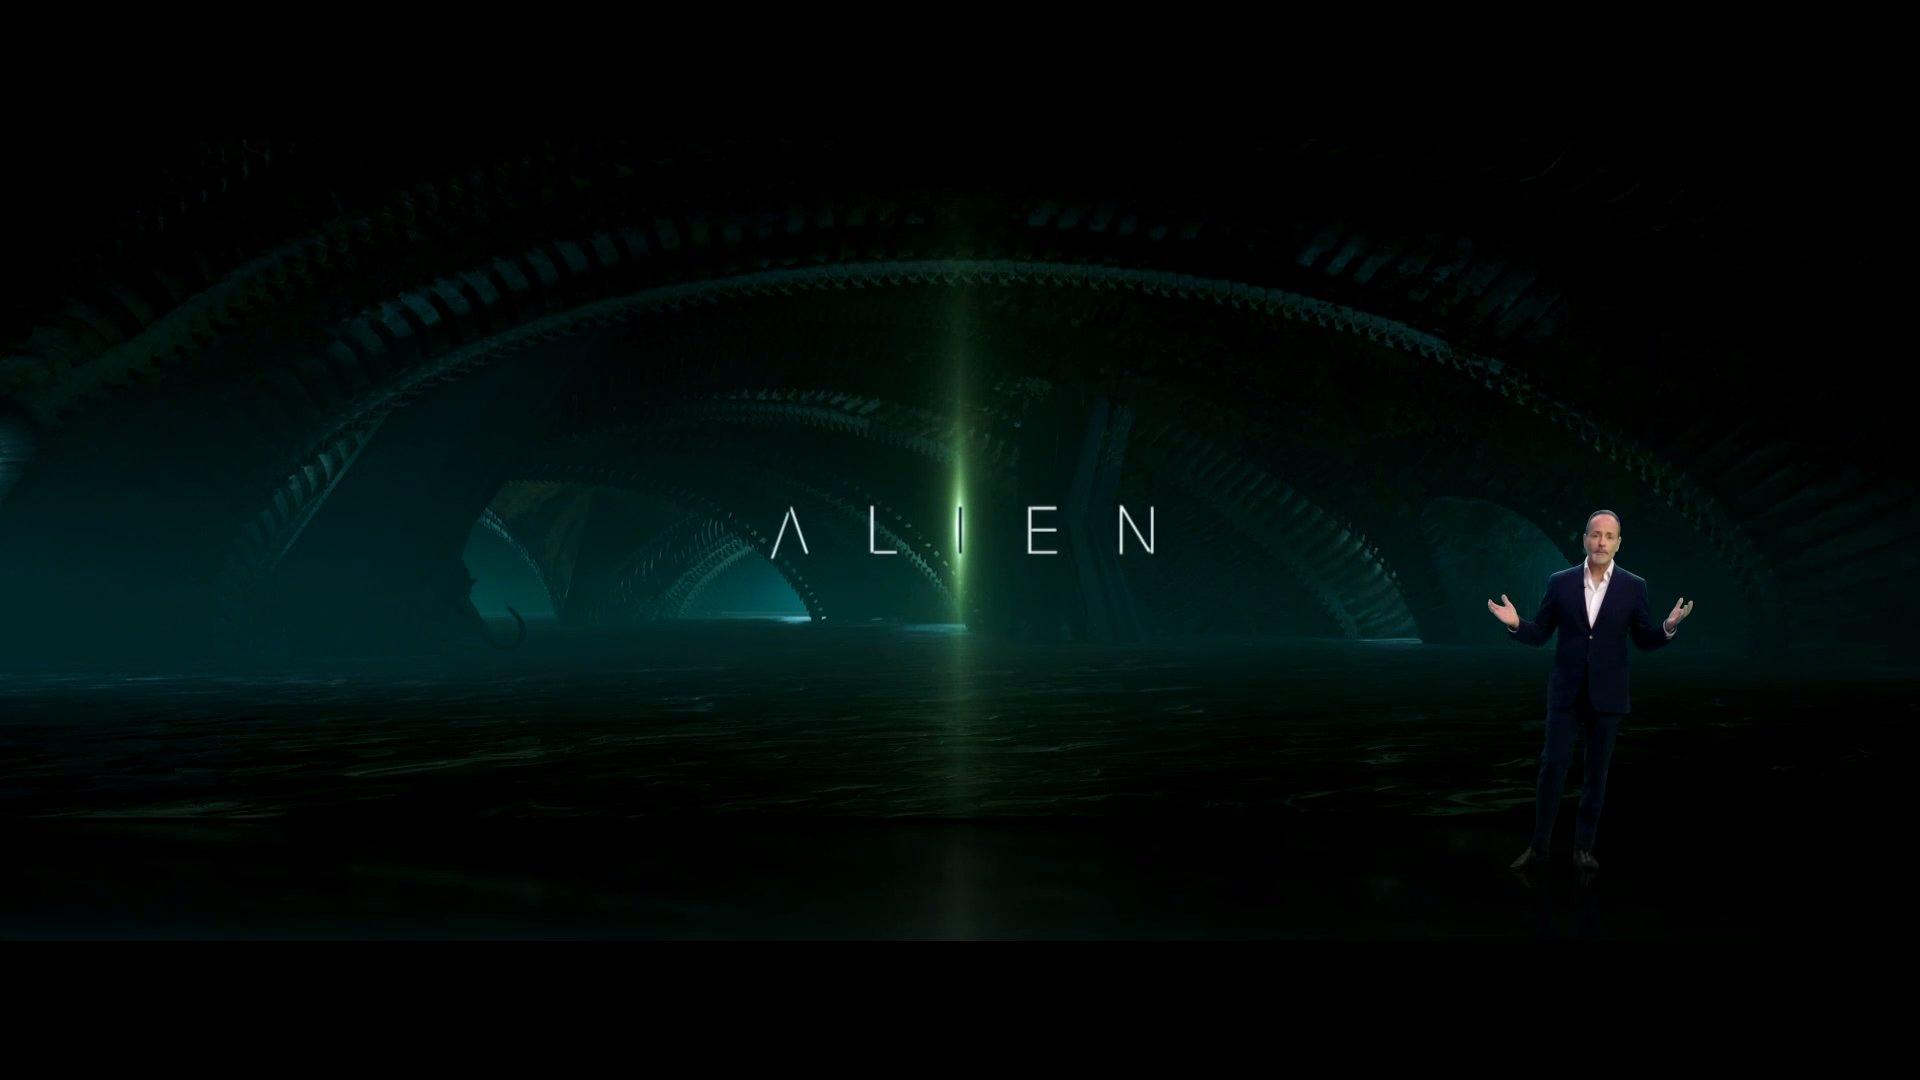 Alien: Serie de TV é confirmada pela Disney e showrunner comenta